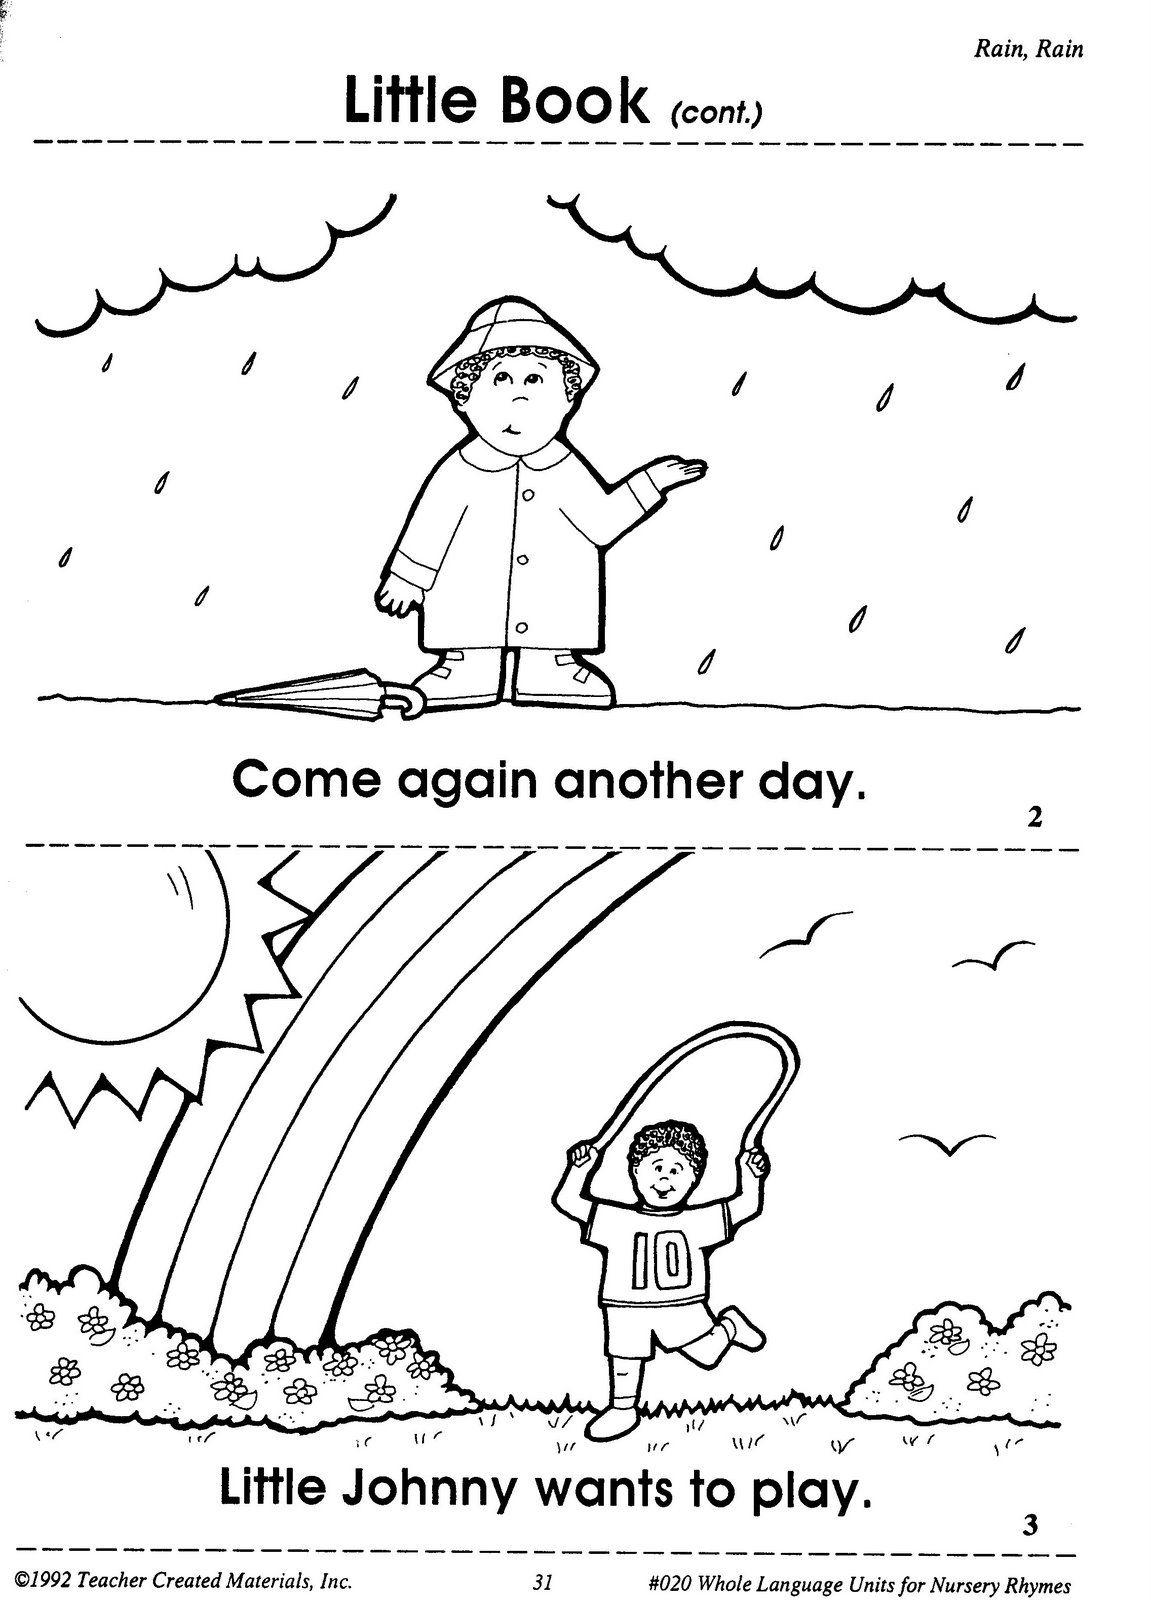 Rain Rain Go Away Come Again Another Day Little Johnny